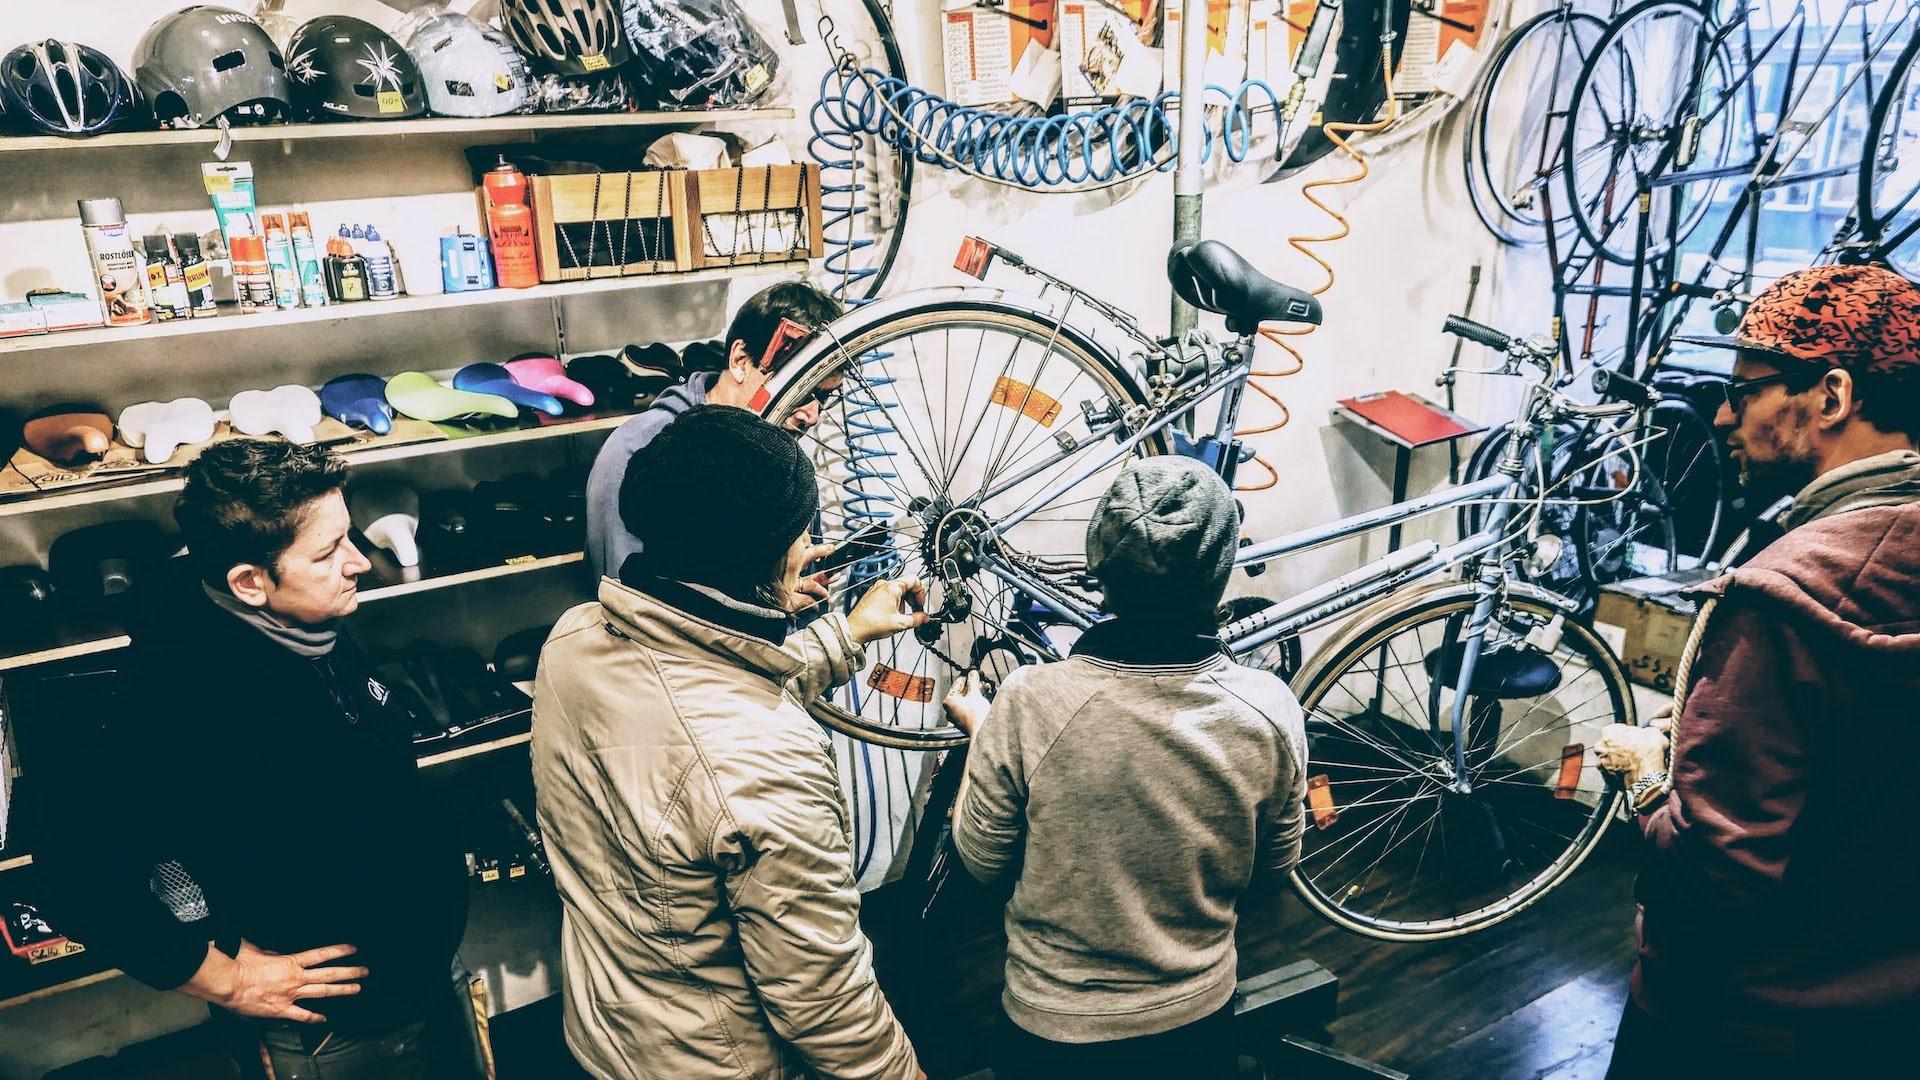 1130868 - Workshops & Reparaturkurse